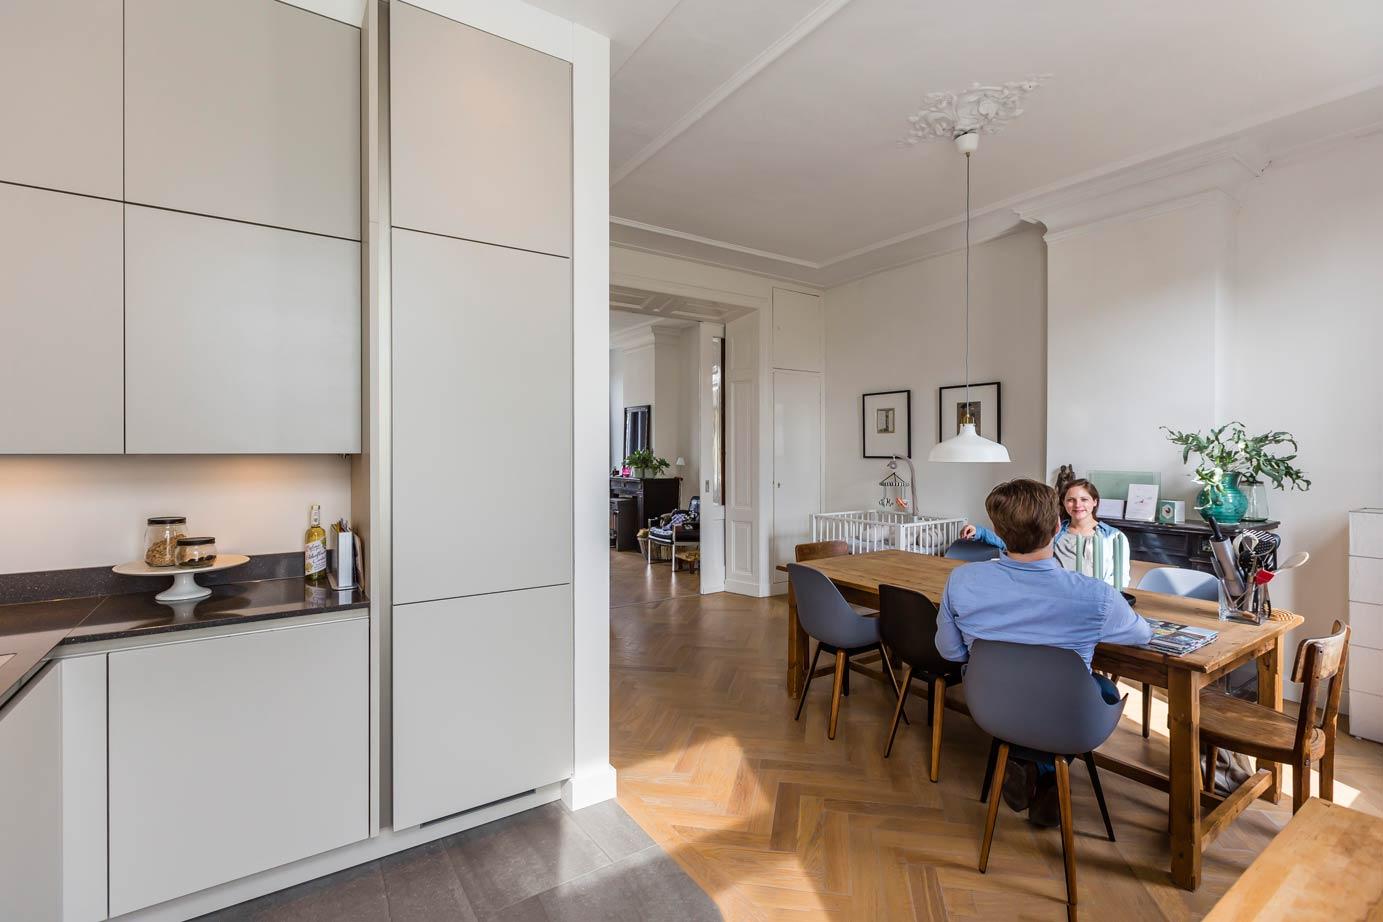 Complete Badkamer Utrecht : Keuken en badkamer kopen utrecht lees klantervaring db keukens